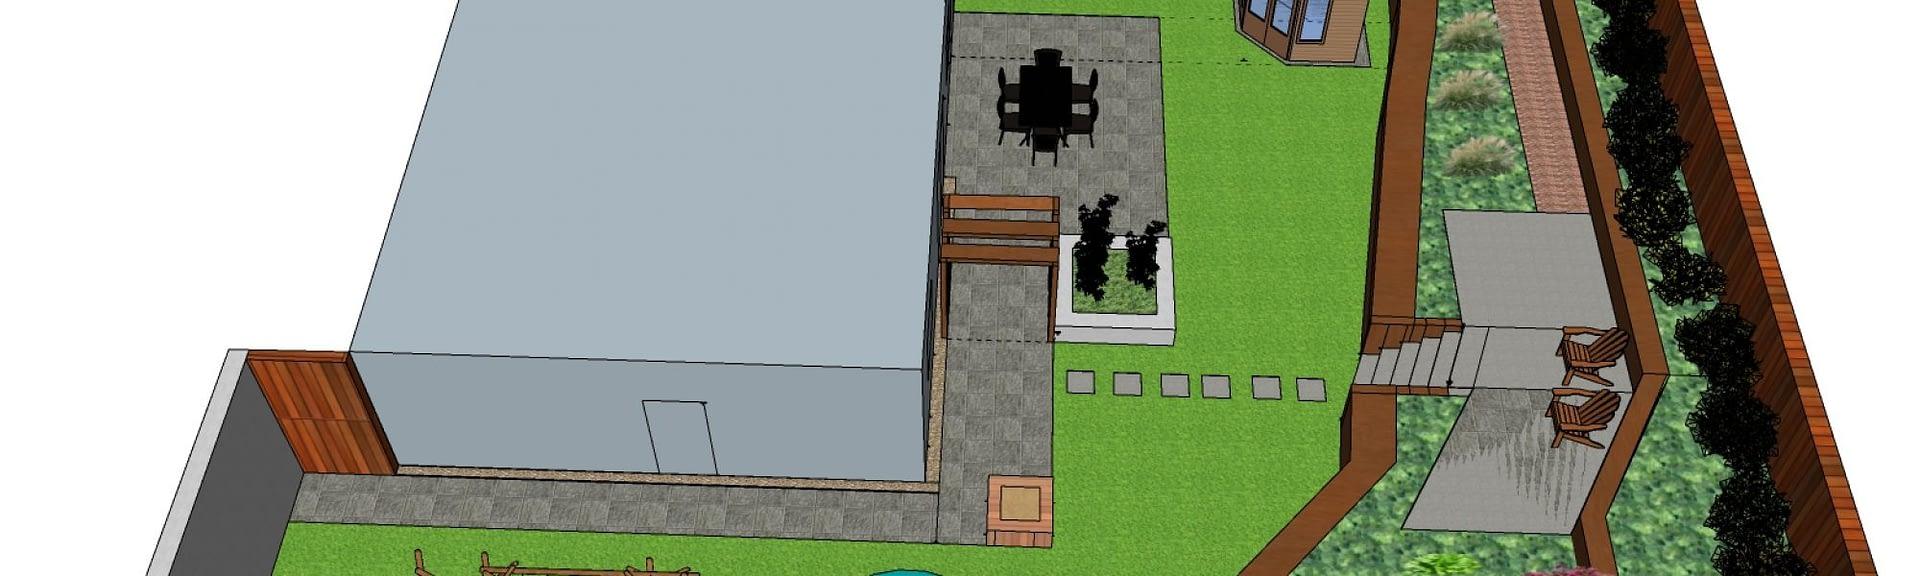 1332020 Lynne Adu Gerbera Designs Garden Design 3D model side view